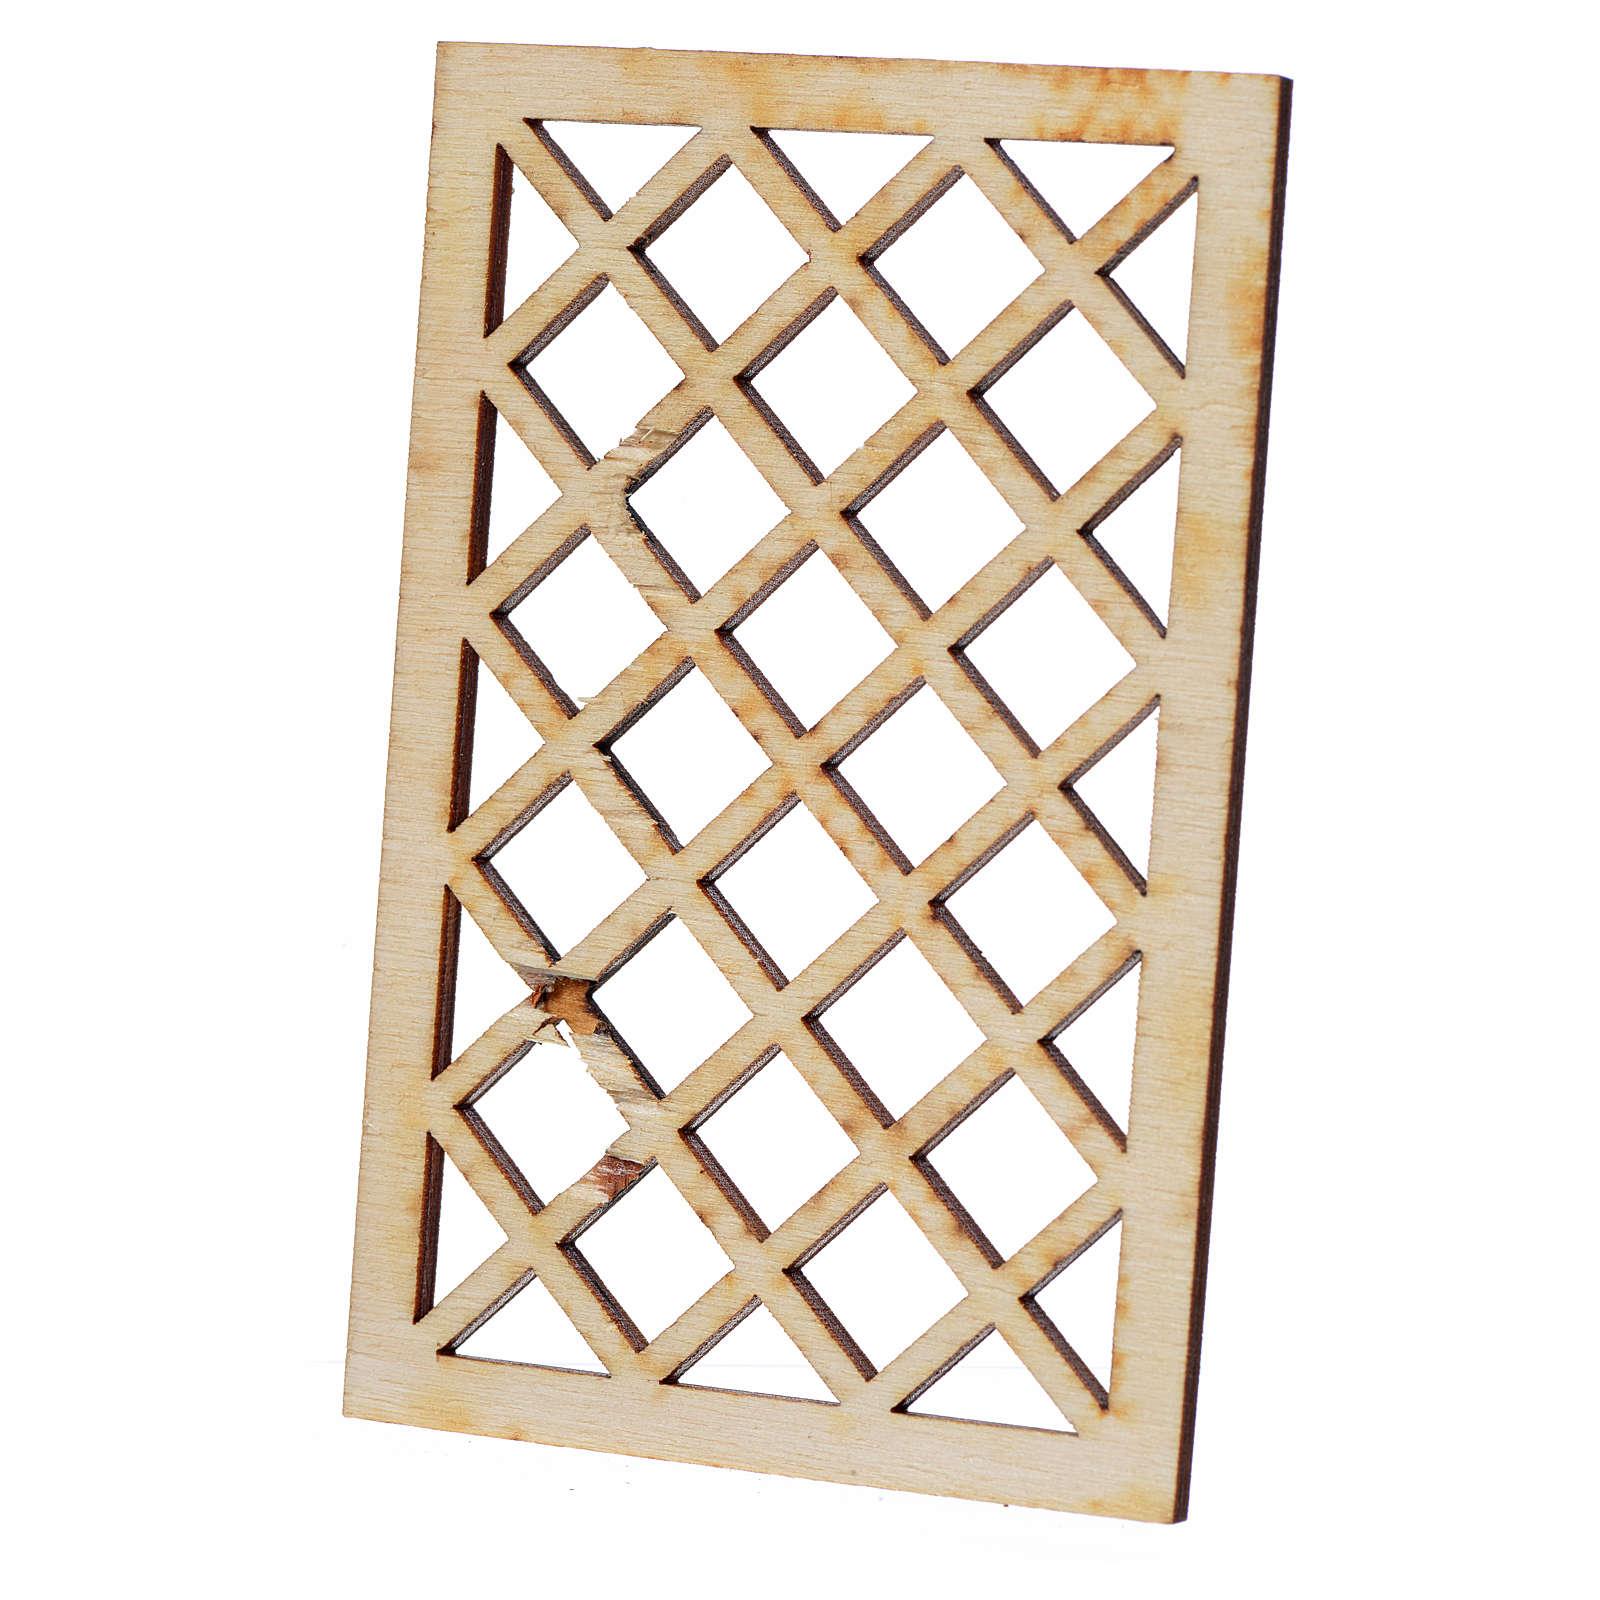 Nativity accessory, wooden bars 9.5x6cm 4